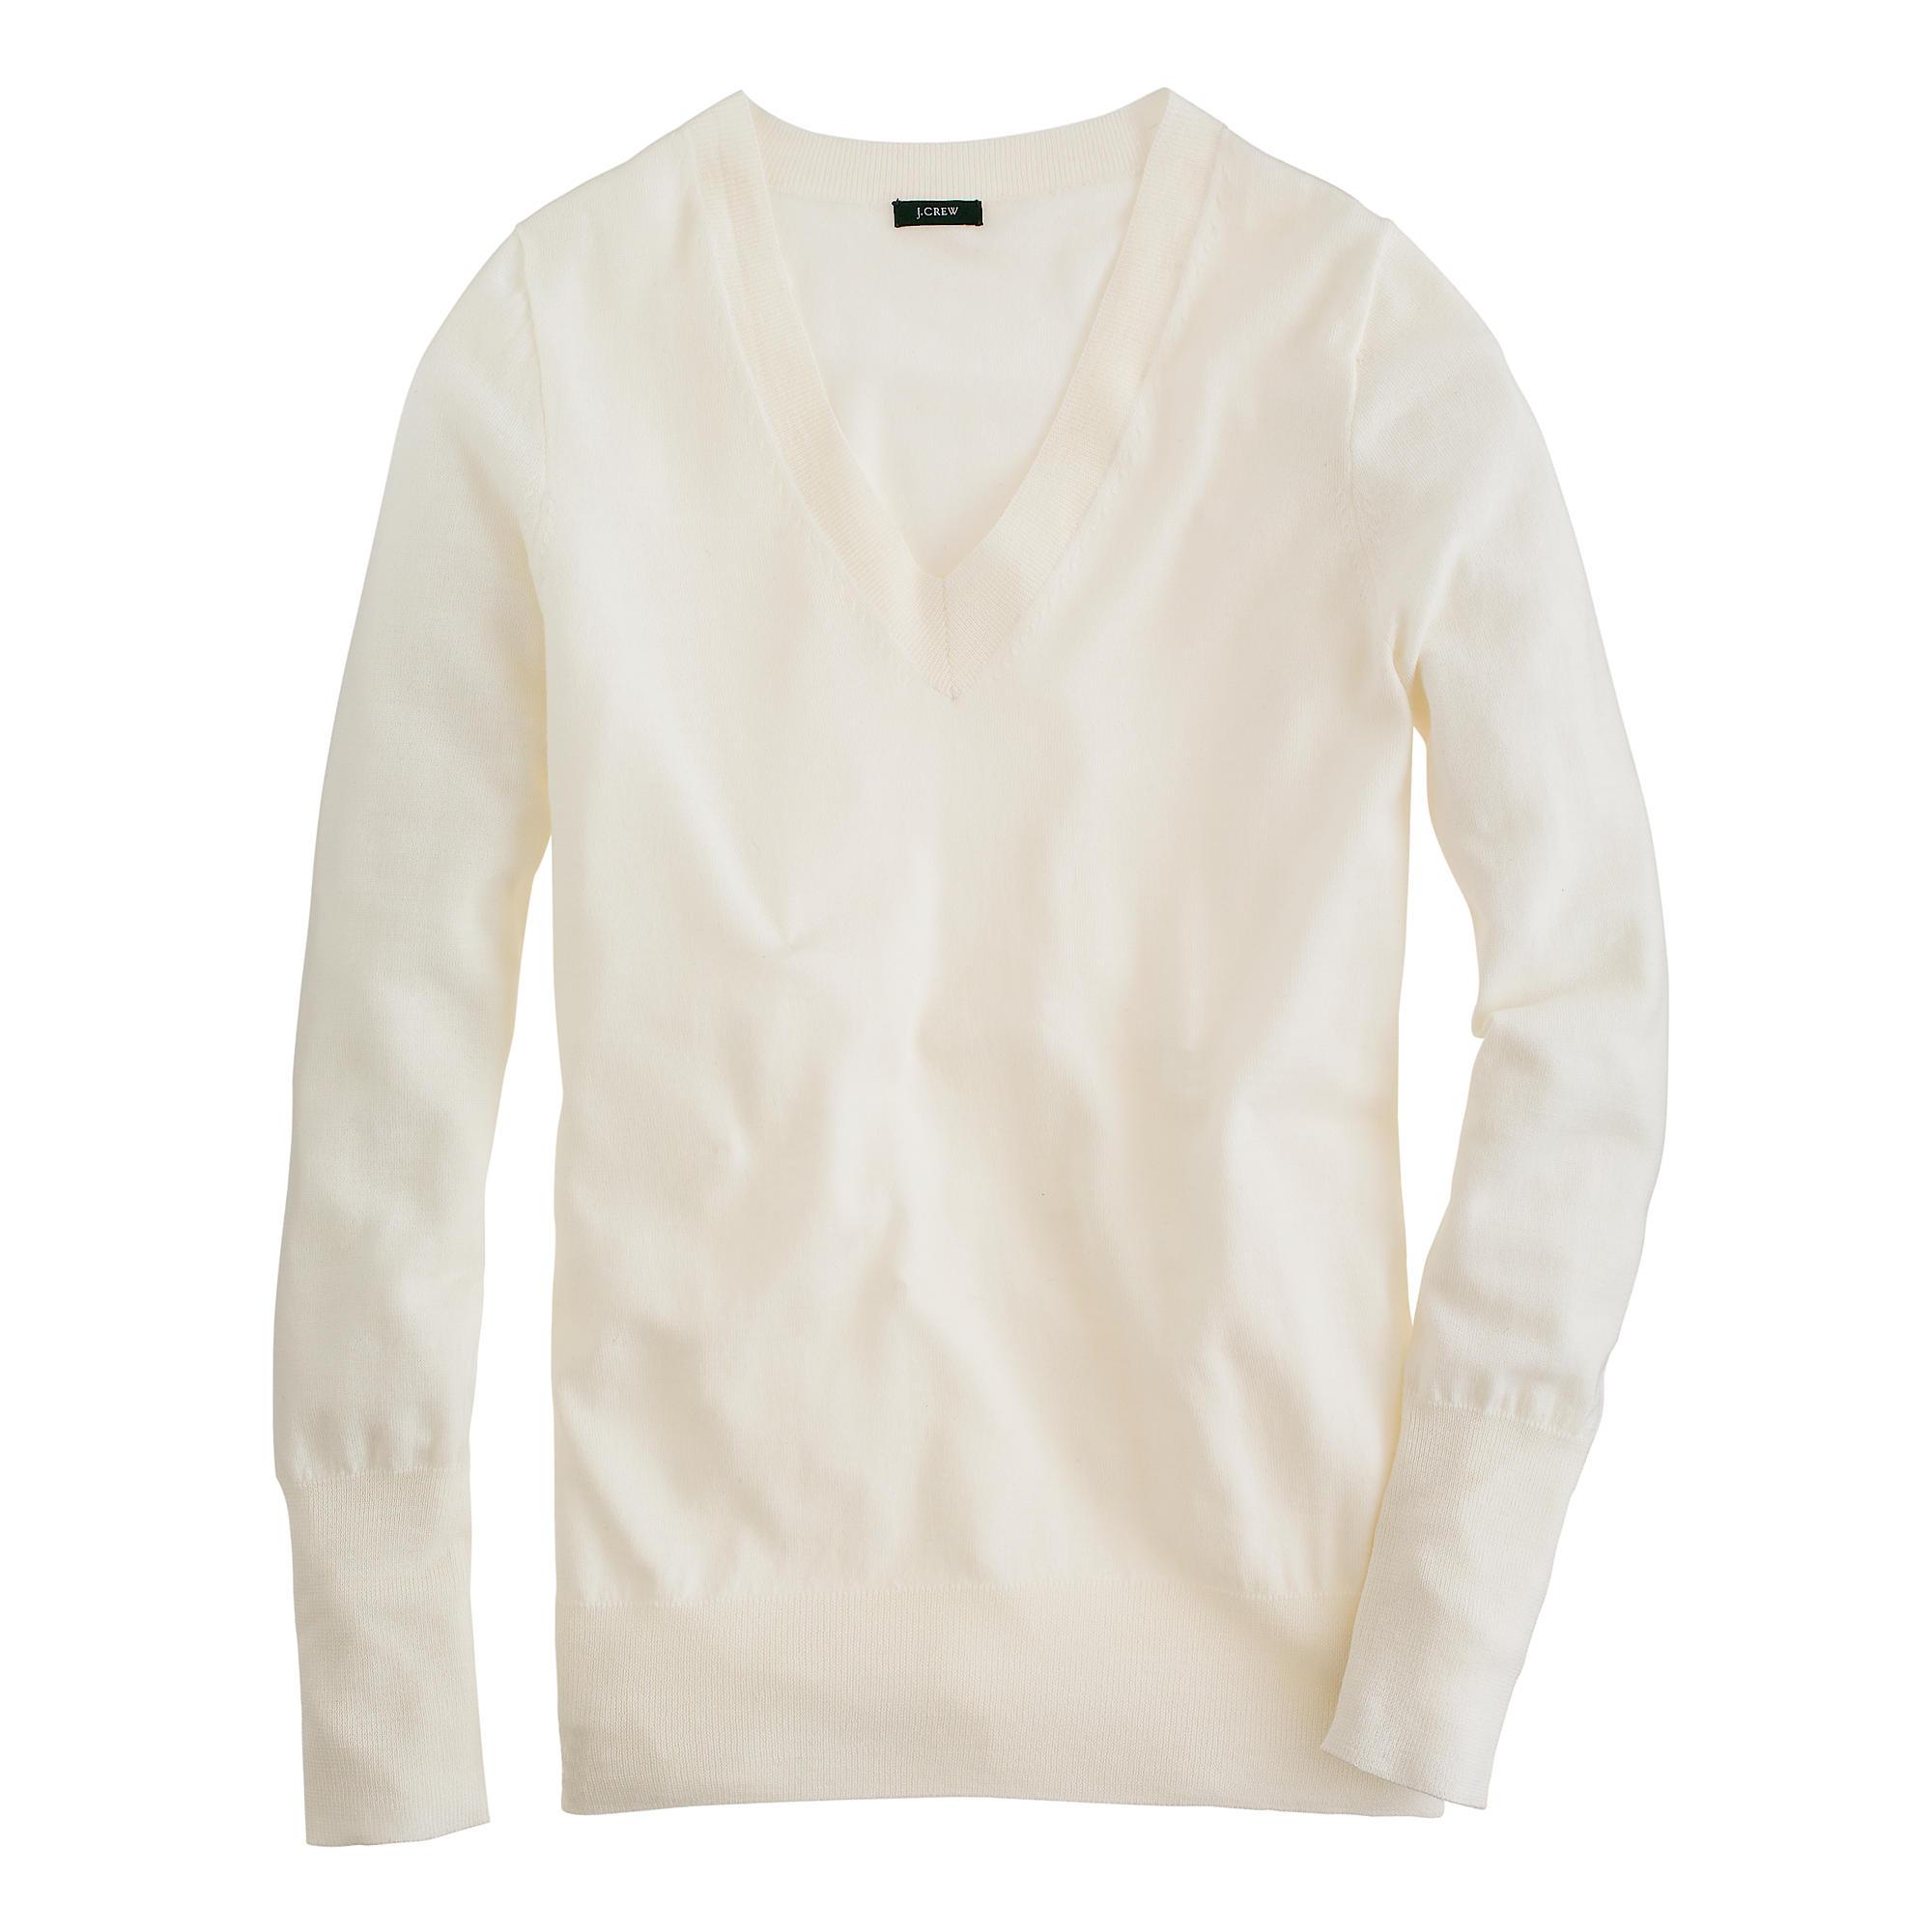 bbf9b9bad3 Lyst - J.Crew Merino Wool V-neck Sweater in White